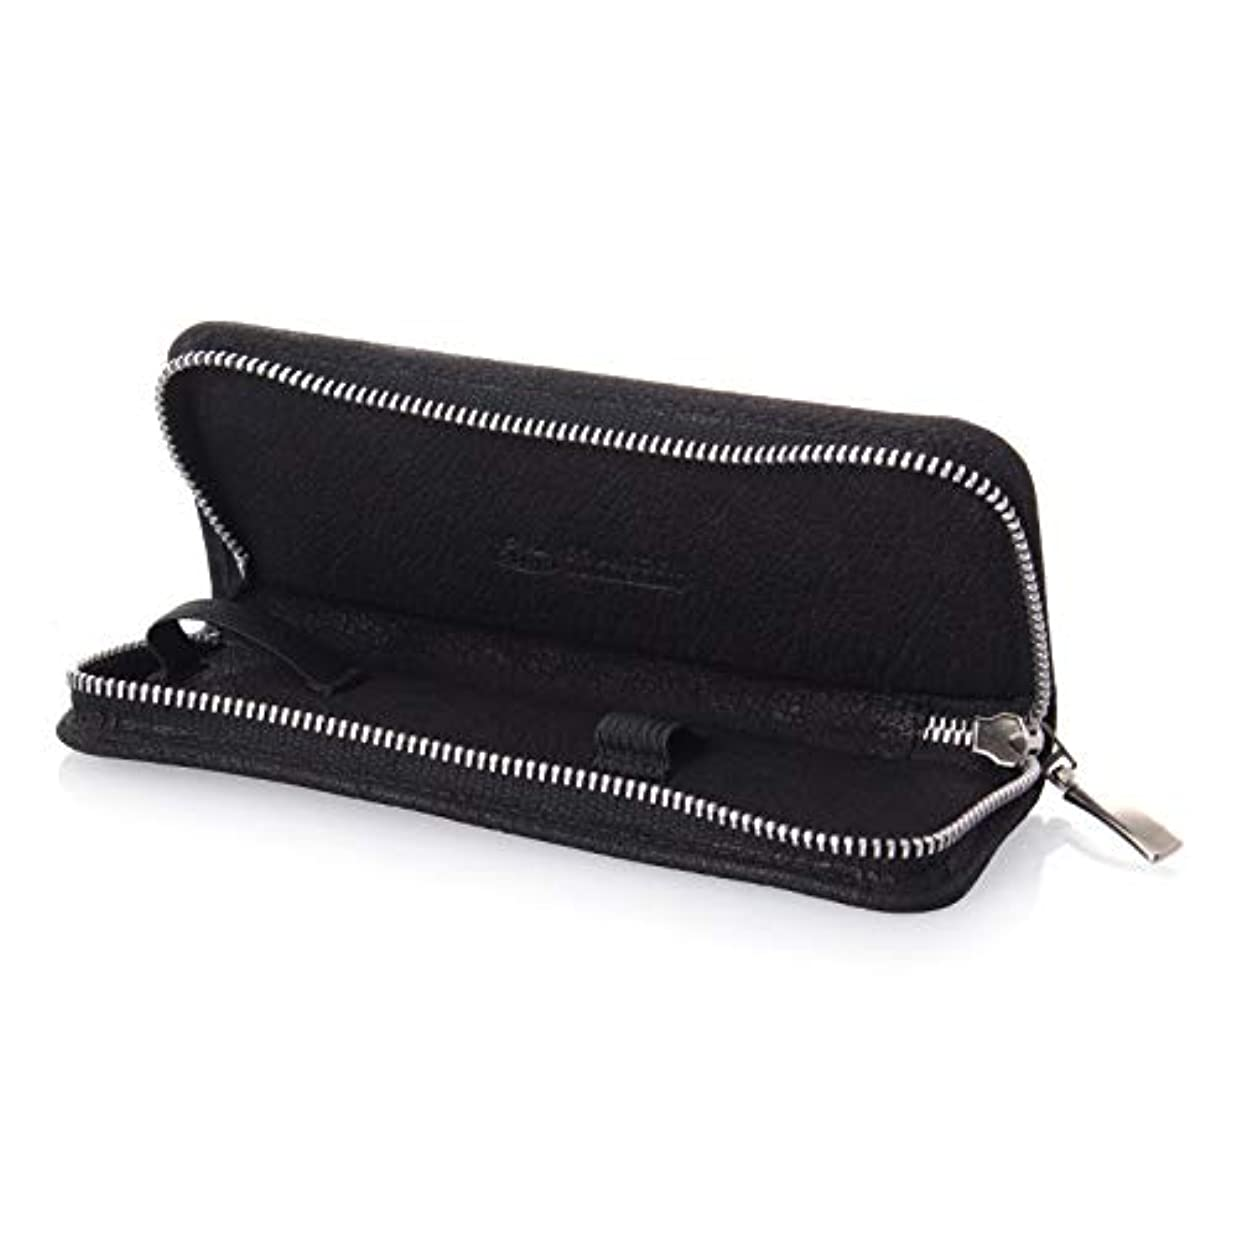 Razor Case, Leather, Black, Erbe Solingen